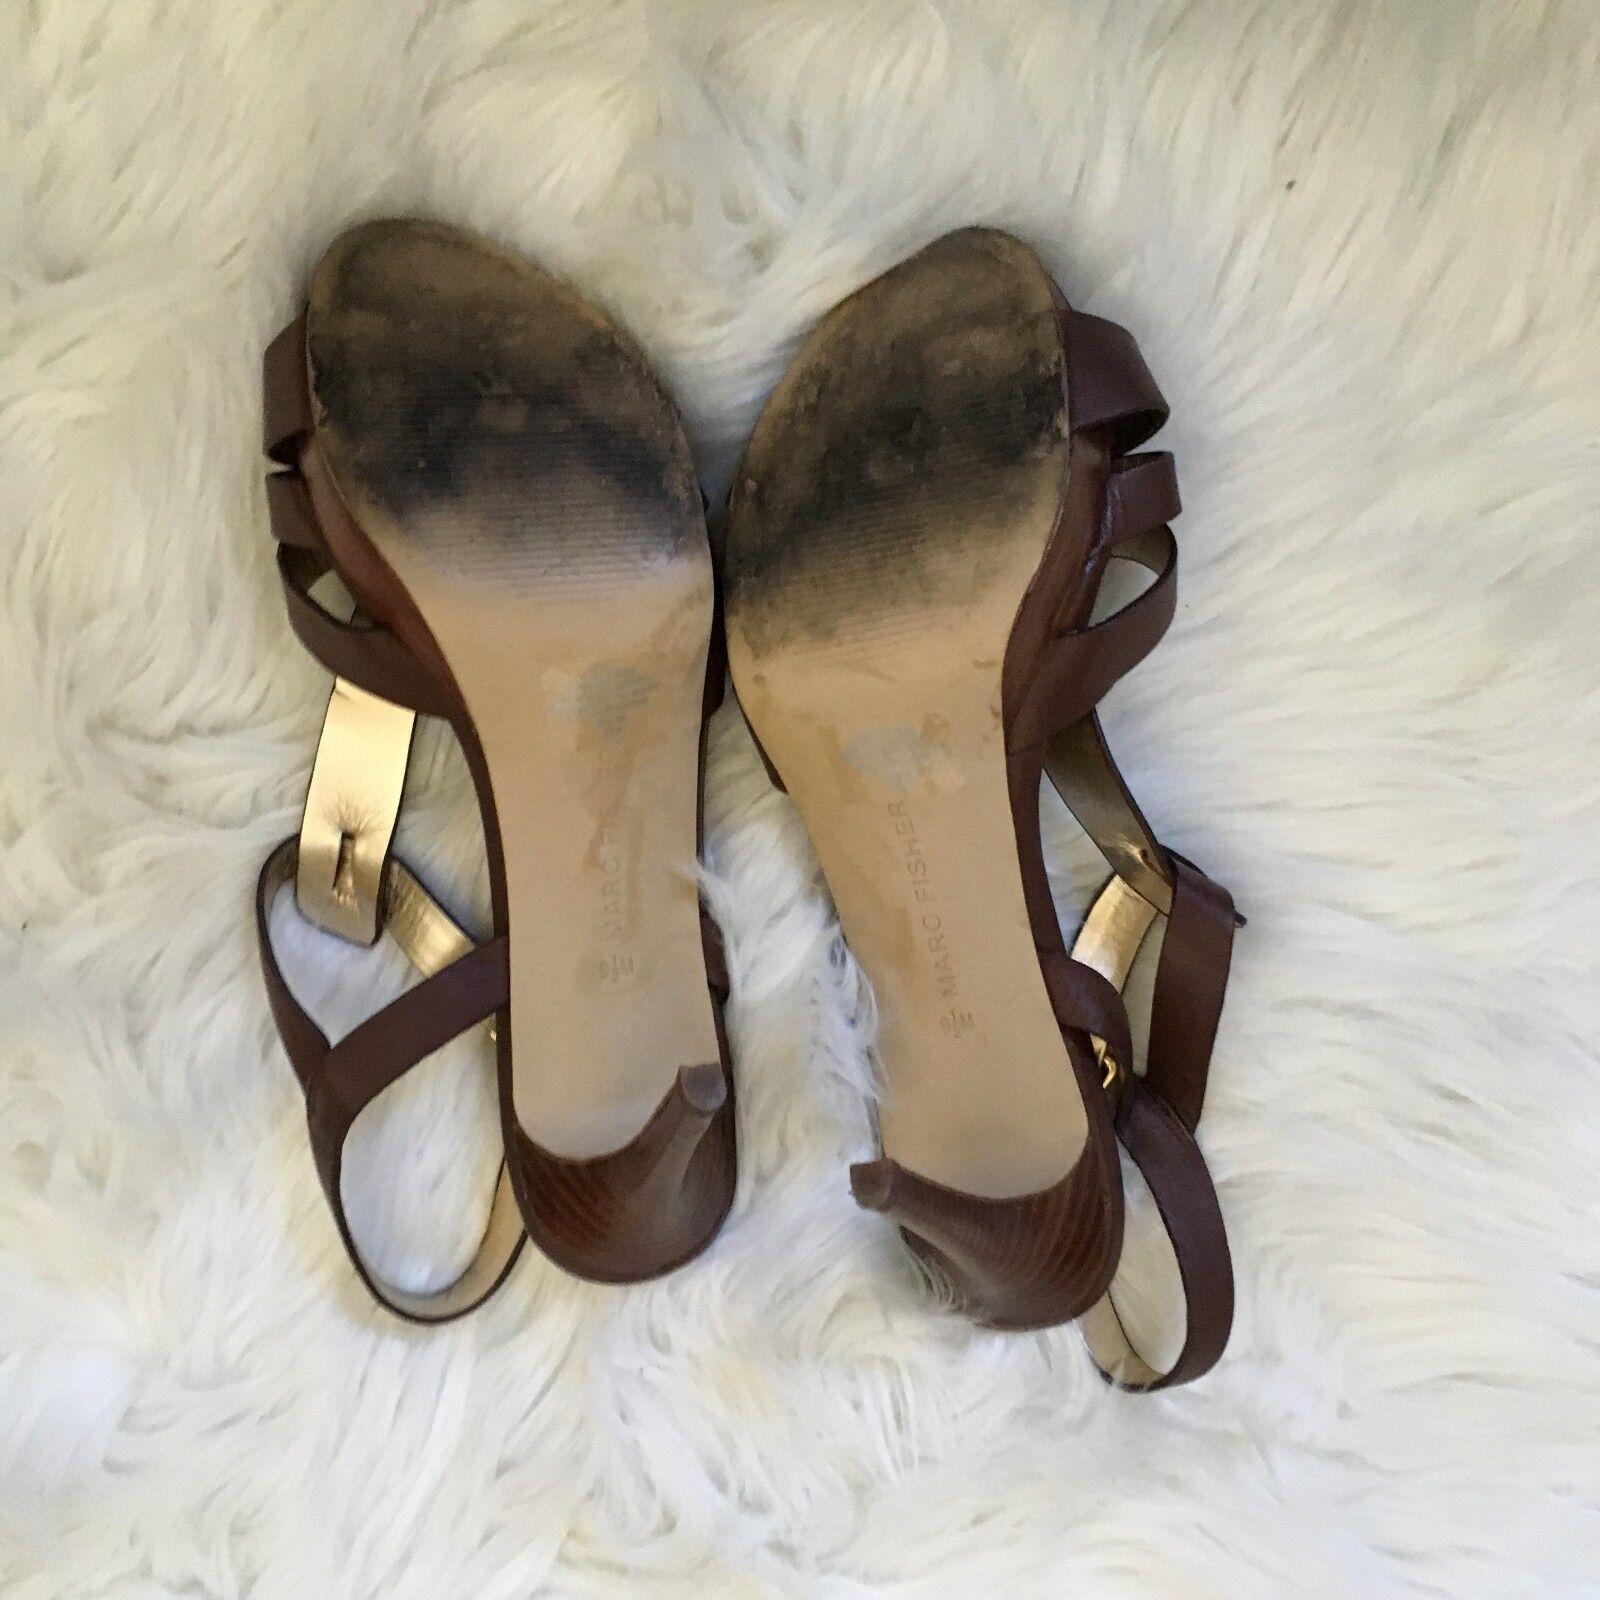 Marc fisher sandals 9.5 Marronee leather t-strap t-strap t-strap varika2 platforms - Dimensione 9.5 edc898